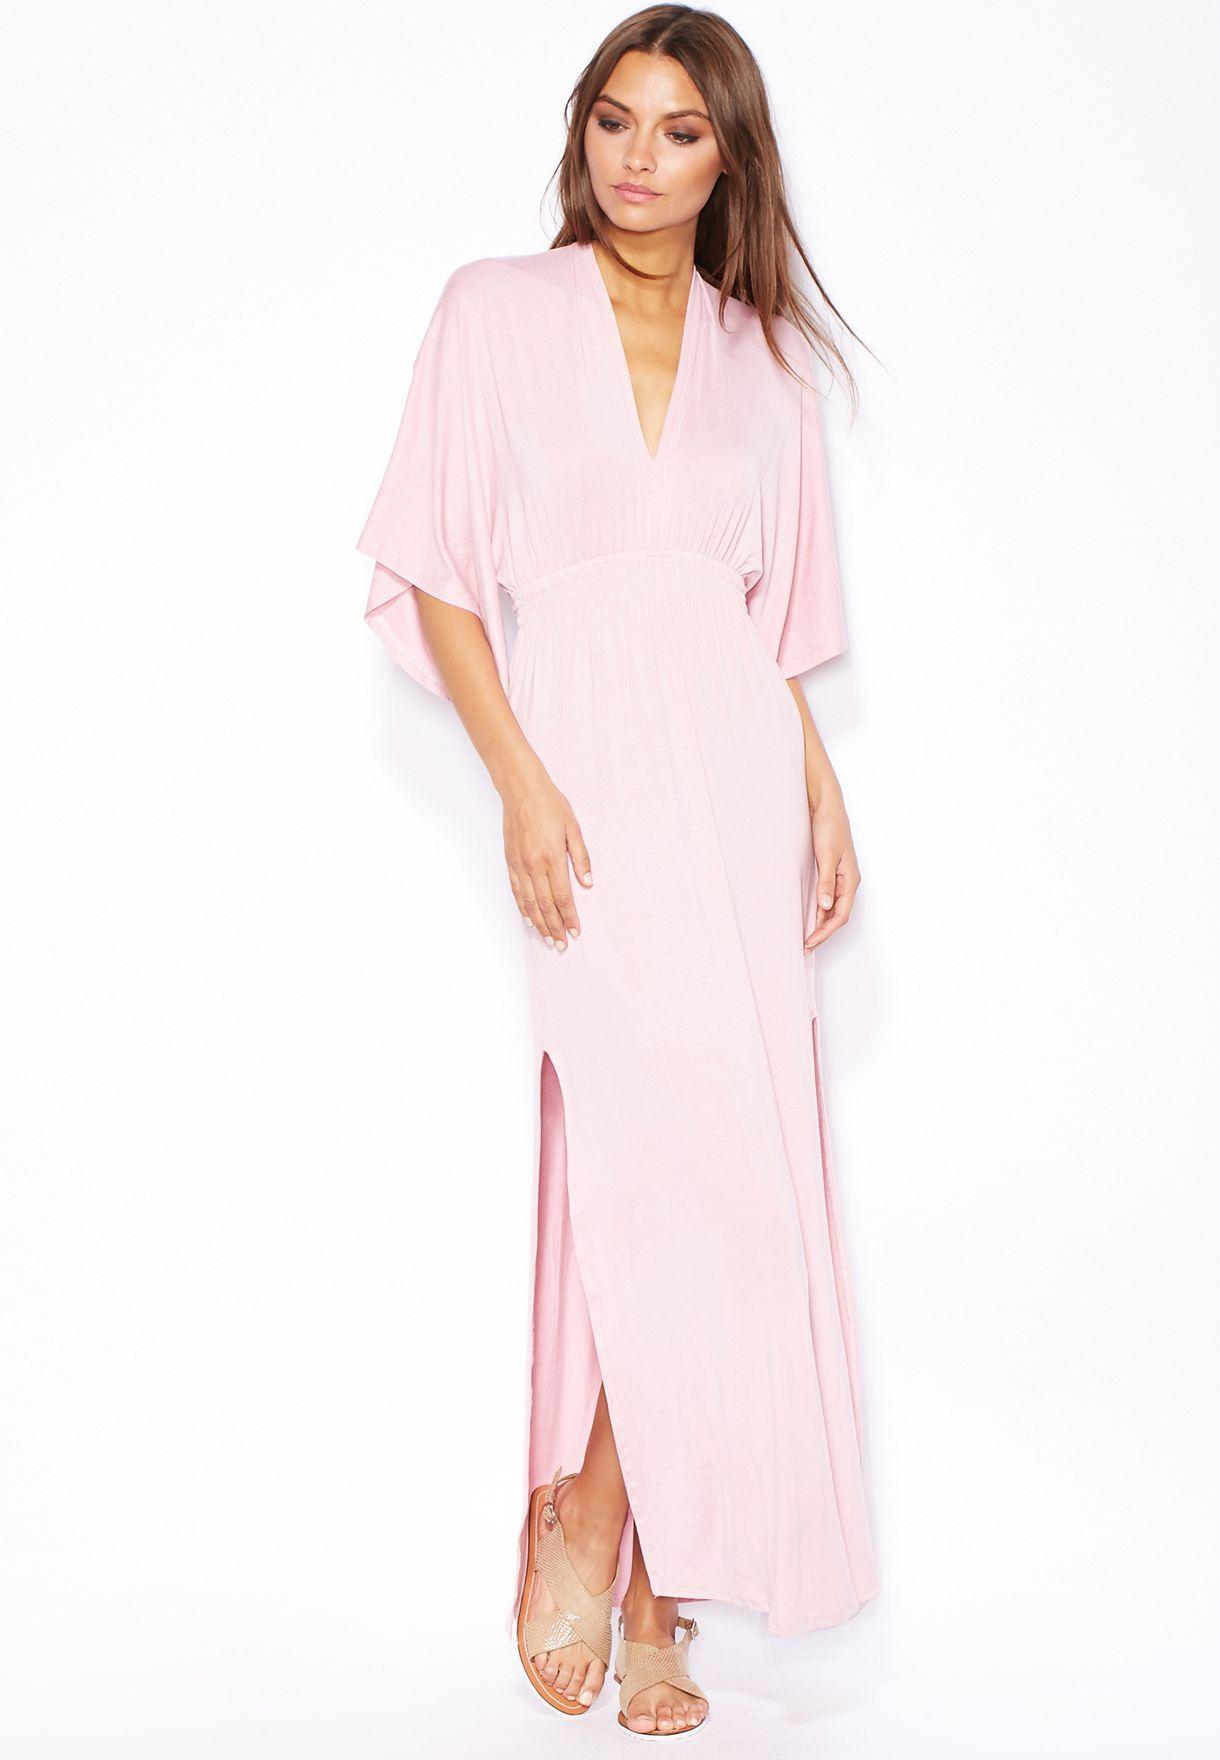 b4a52736dcfd2 تسوق فستان ماكسي بخصر مزموم ماركة جينجر لون وردي في السعودية ...